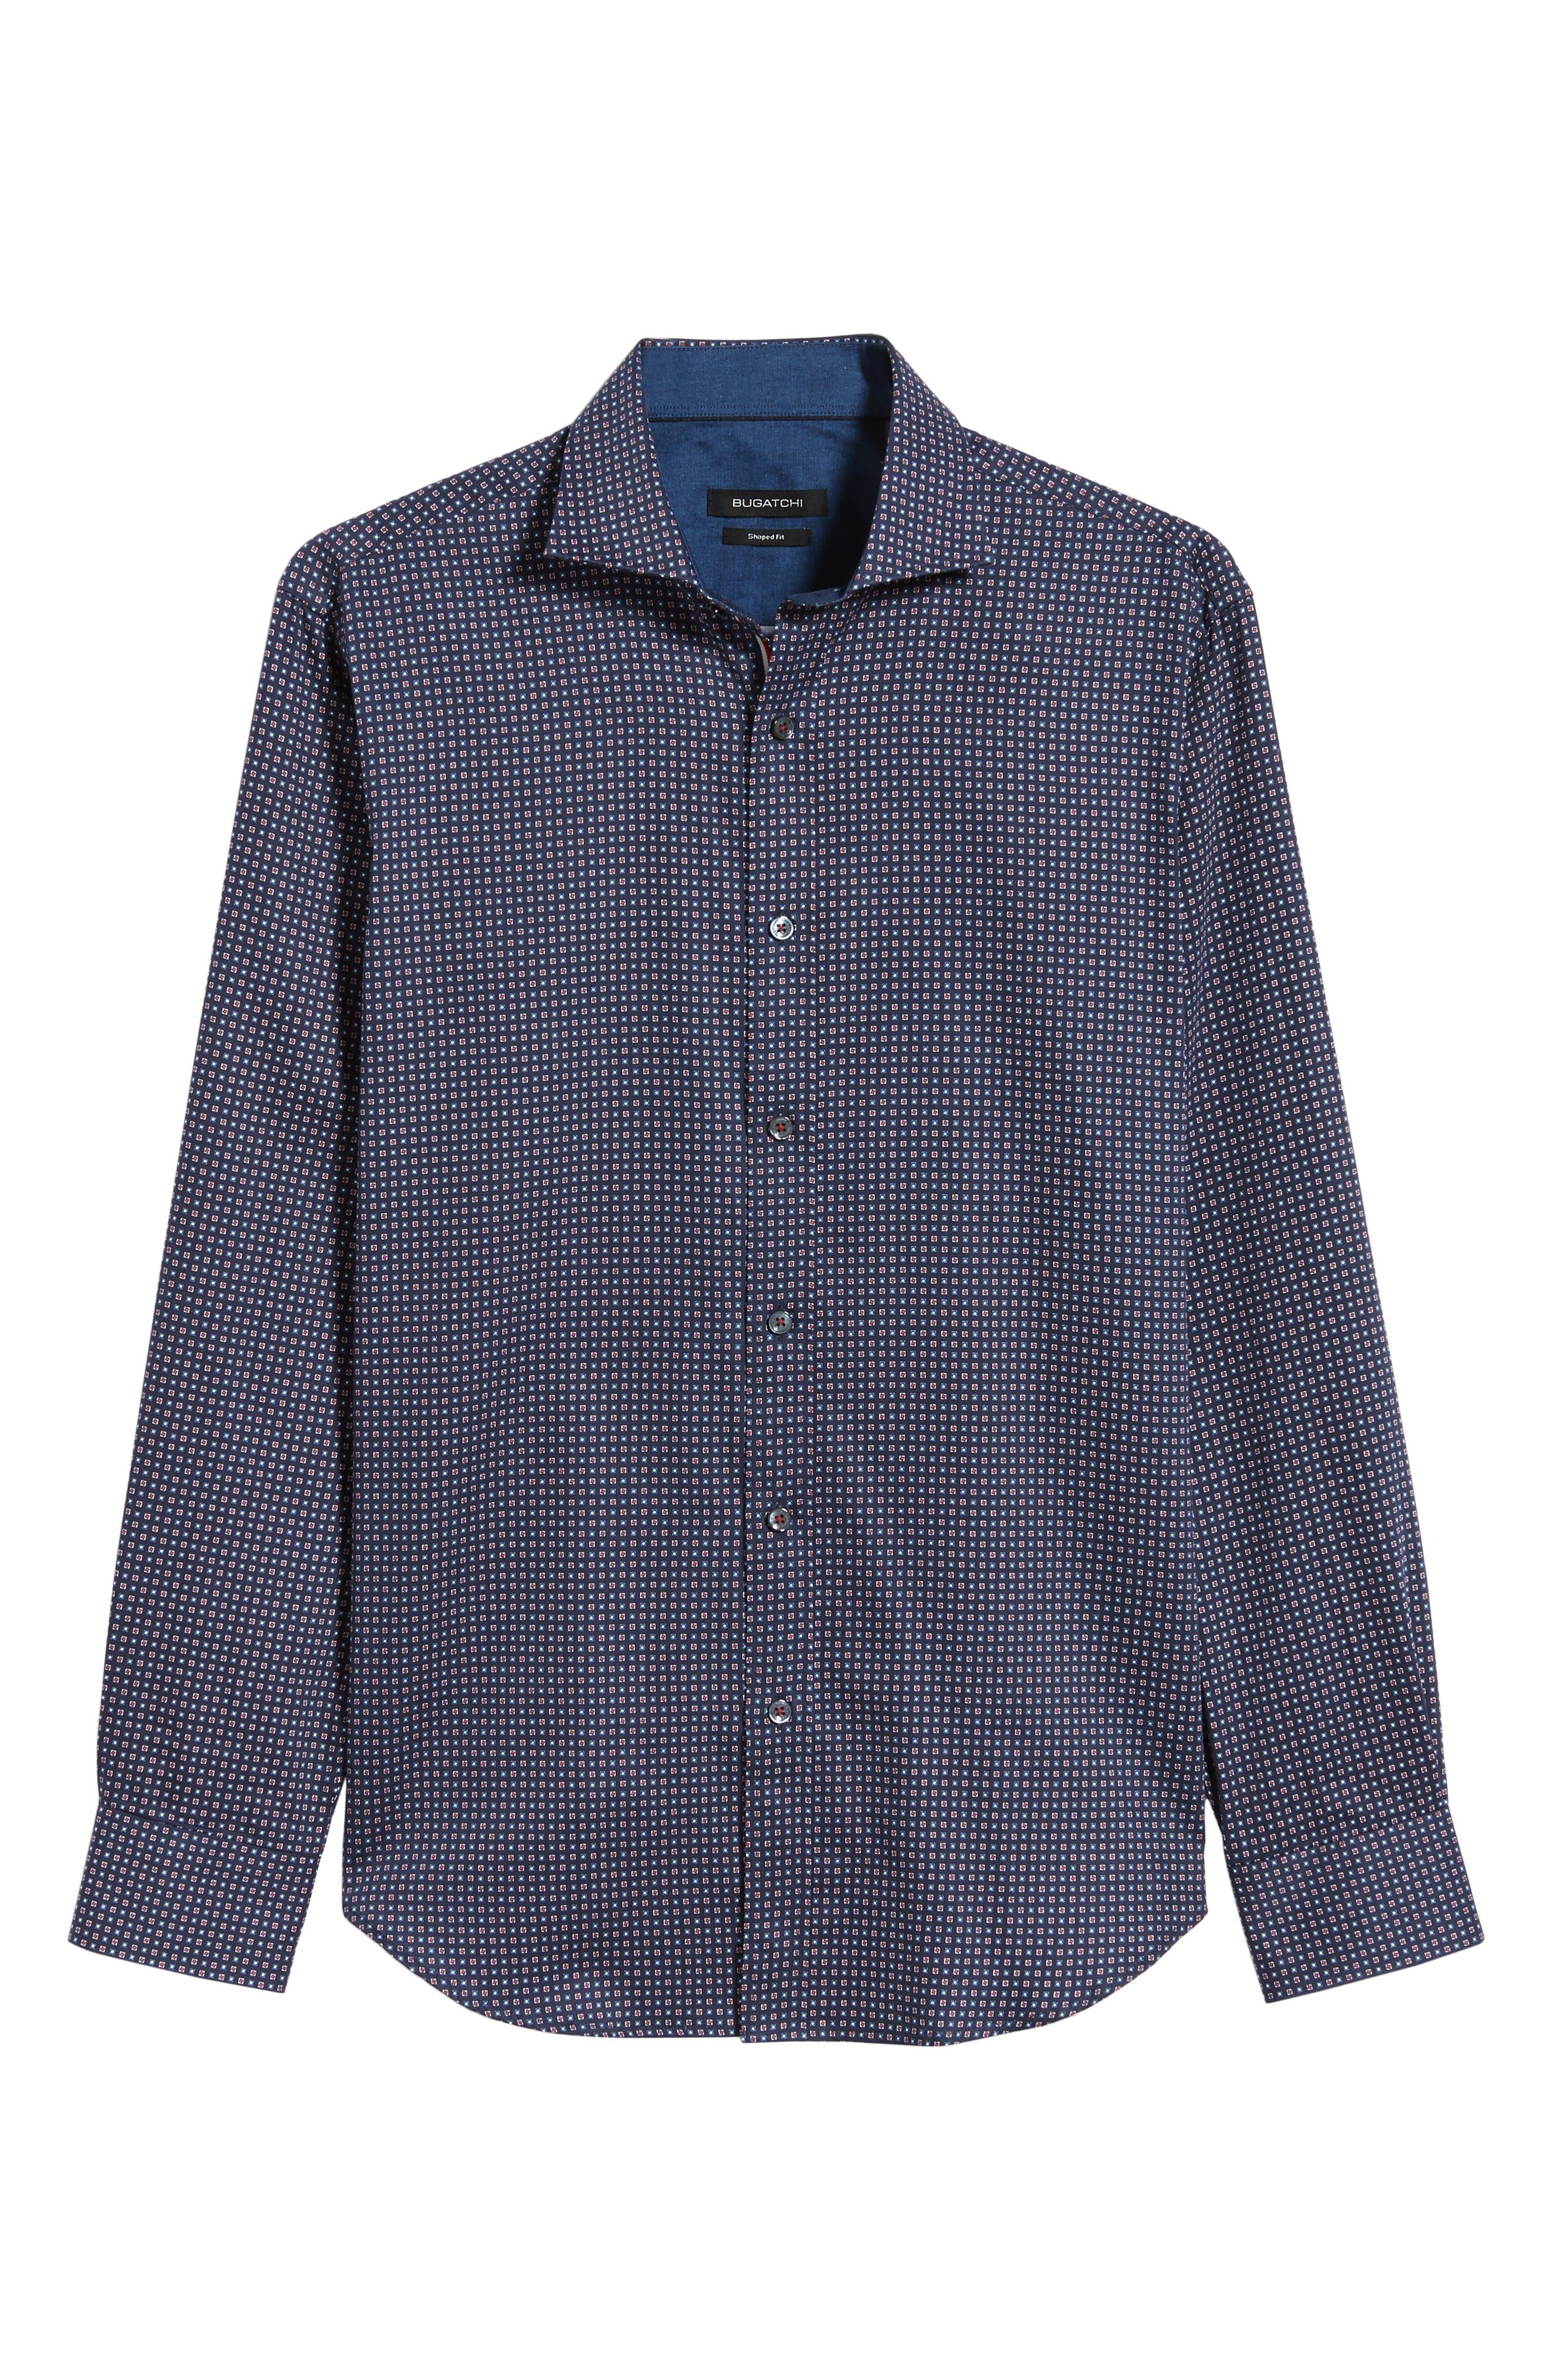 BUGATCHI,                             Shaped Fit Print Sport Shirt,                             Alternate thumbnail 5, color,                             400